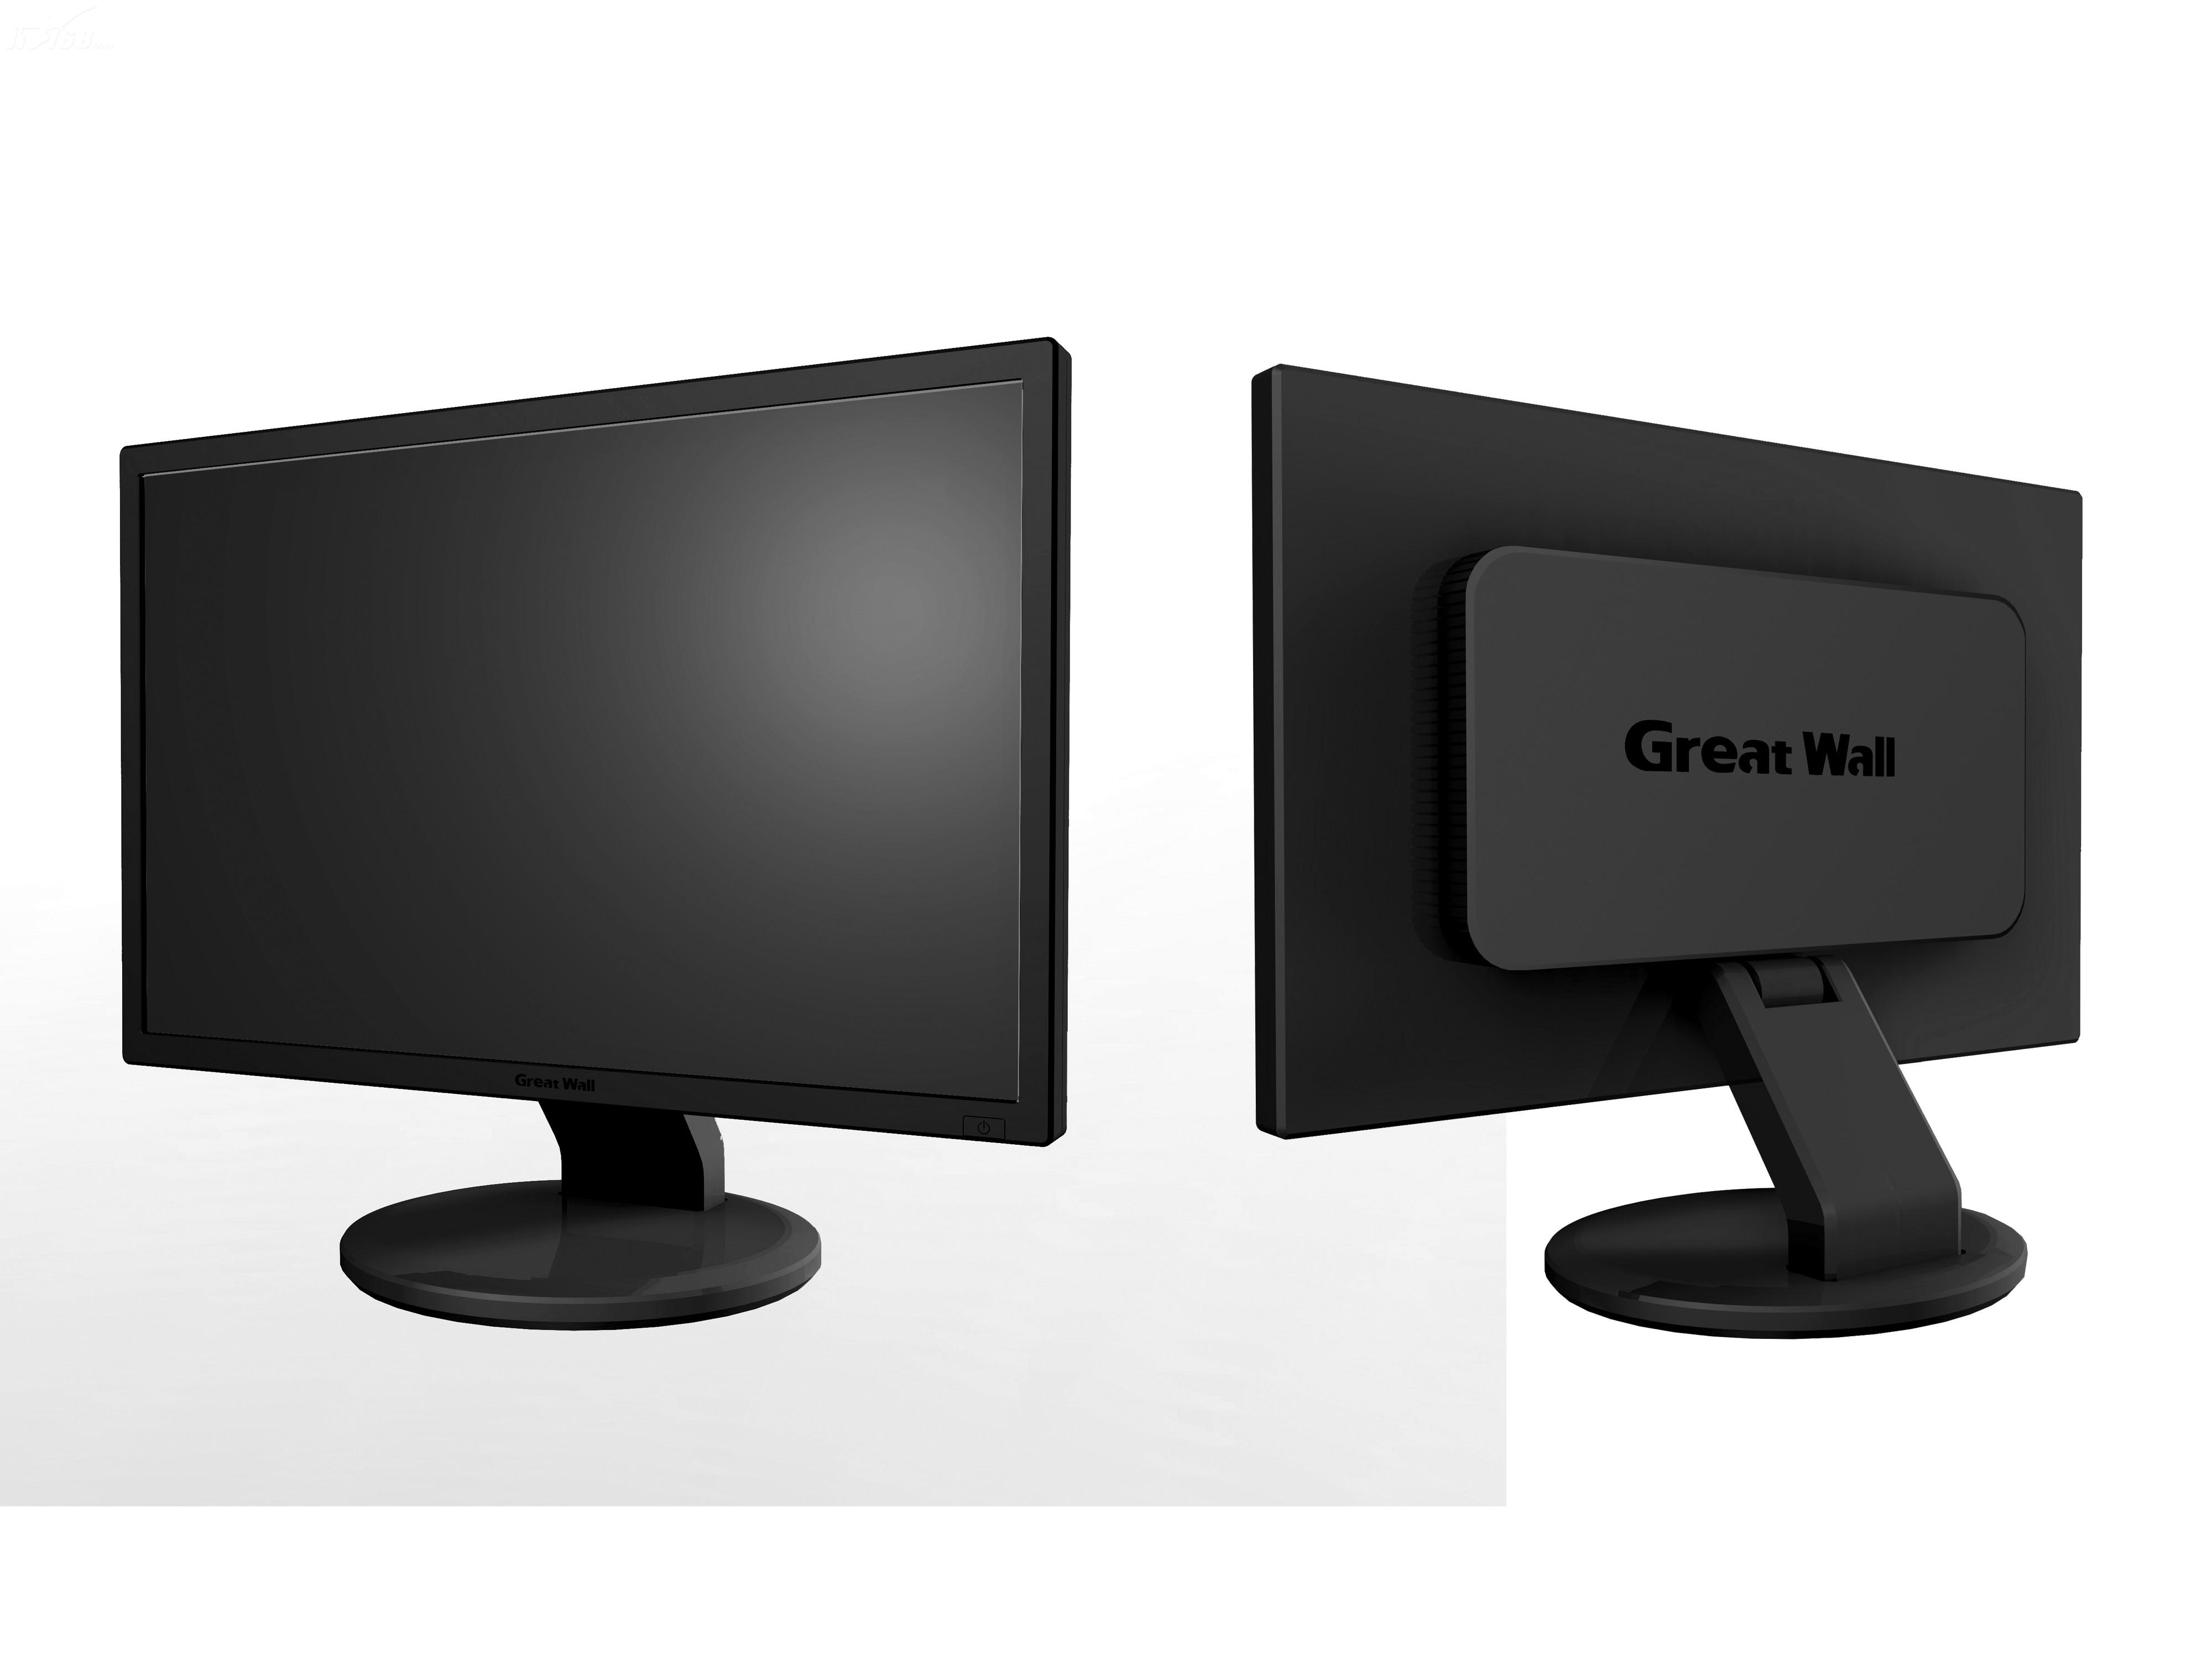 great wallz226液晶显示器产品图片7素材-it168液晶器